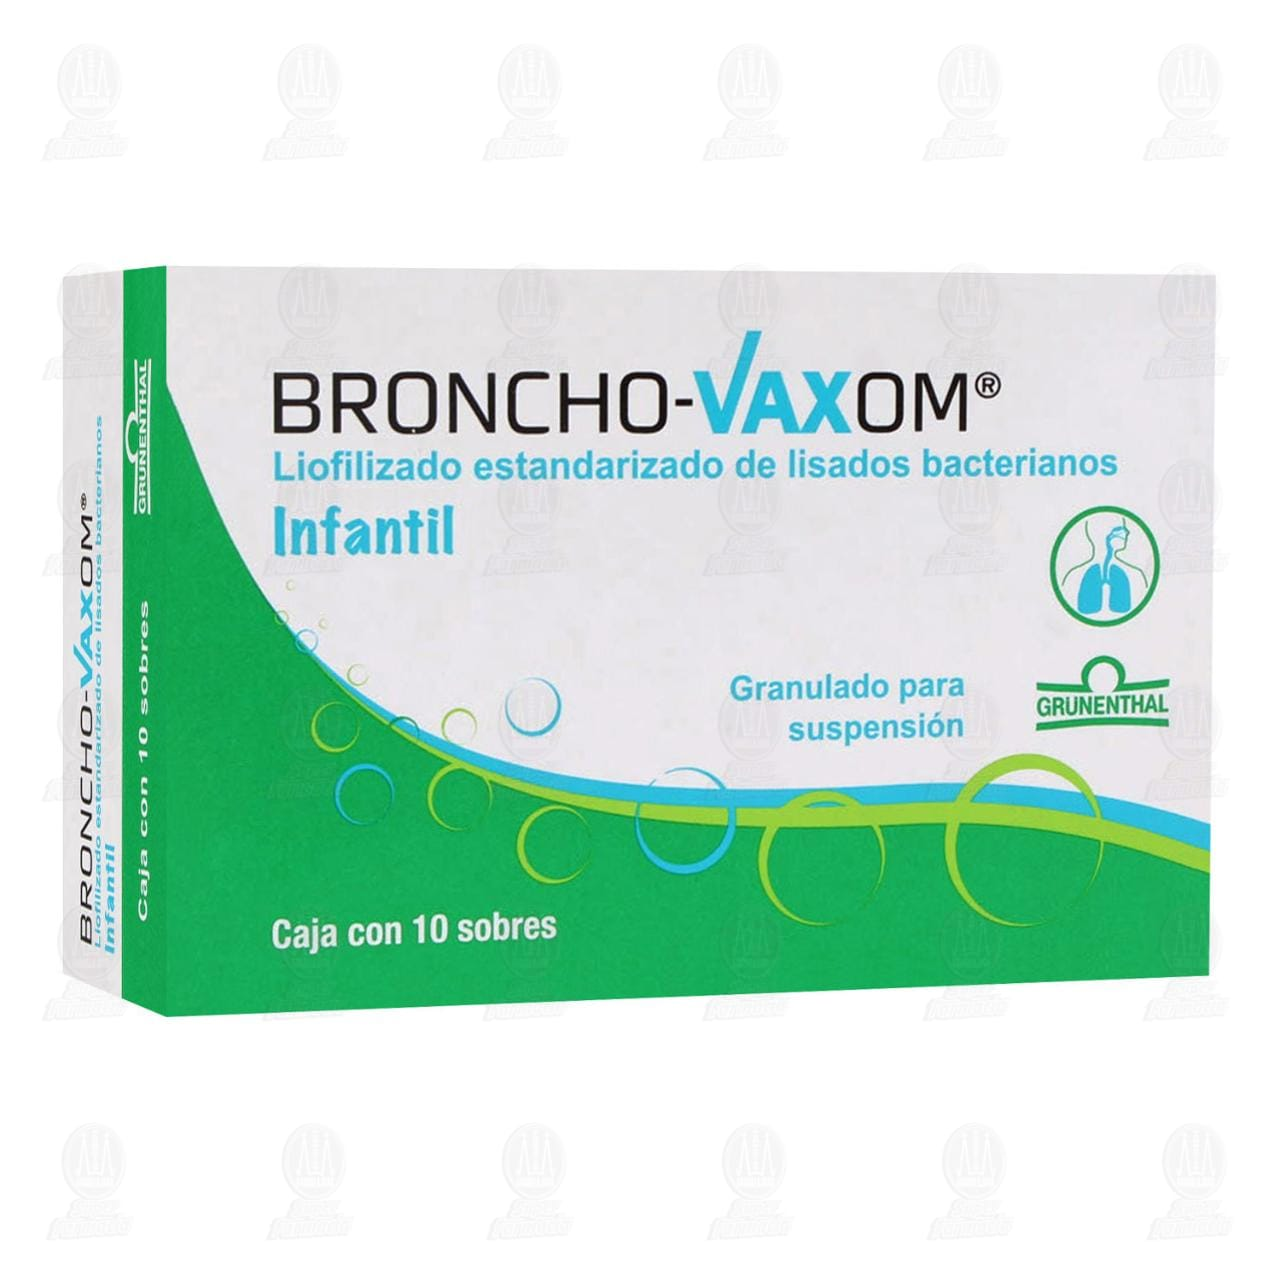 Comprar Broncho-Vaxom Infantil 10 Sobres en Farmacias Guadalajara